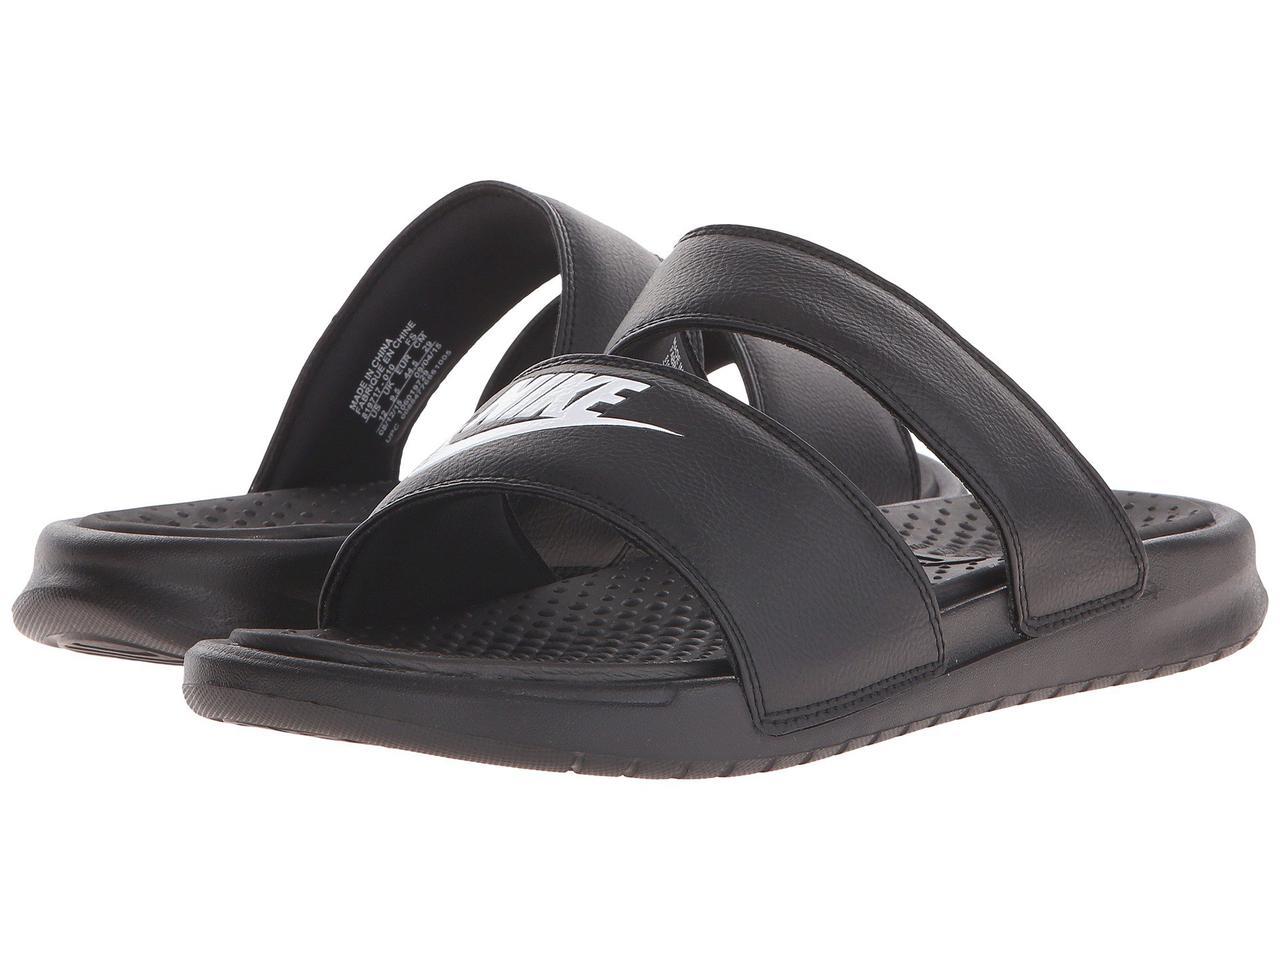 Сандали/Вьетнамки (Оригинал) Nike Benassi Duo Ultra Slide Black/White